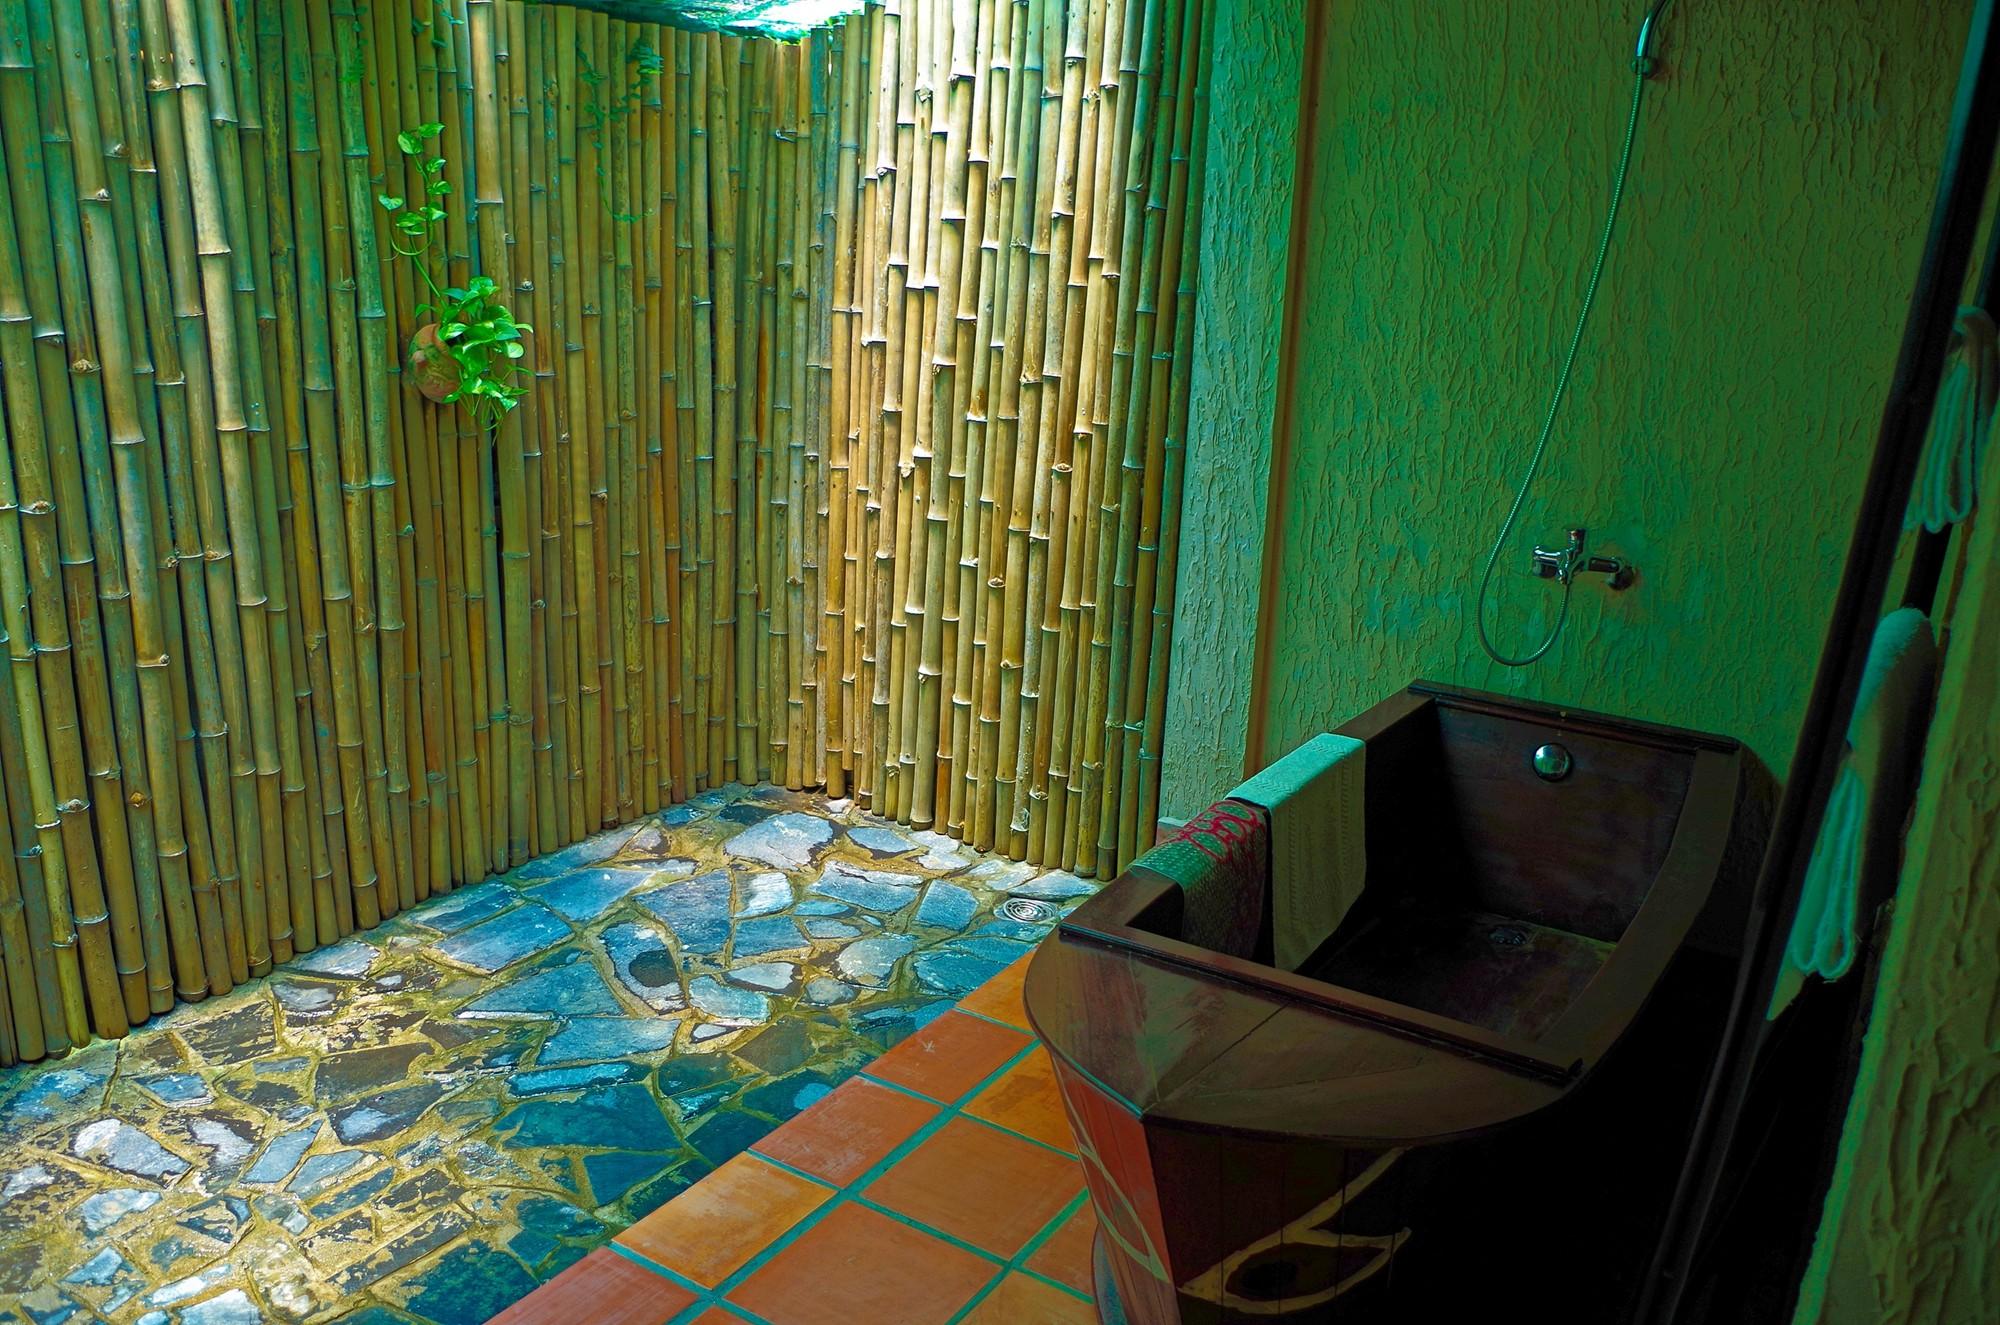 Salle de bain de plein air privative du Mekong Lodge